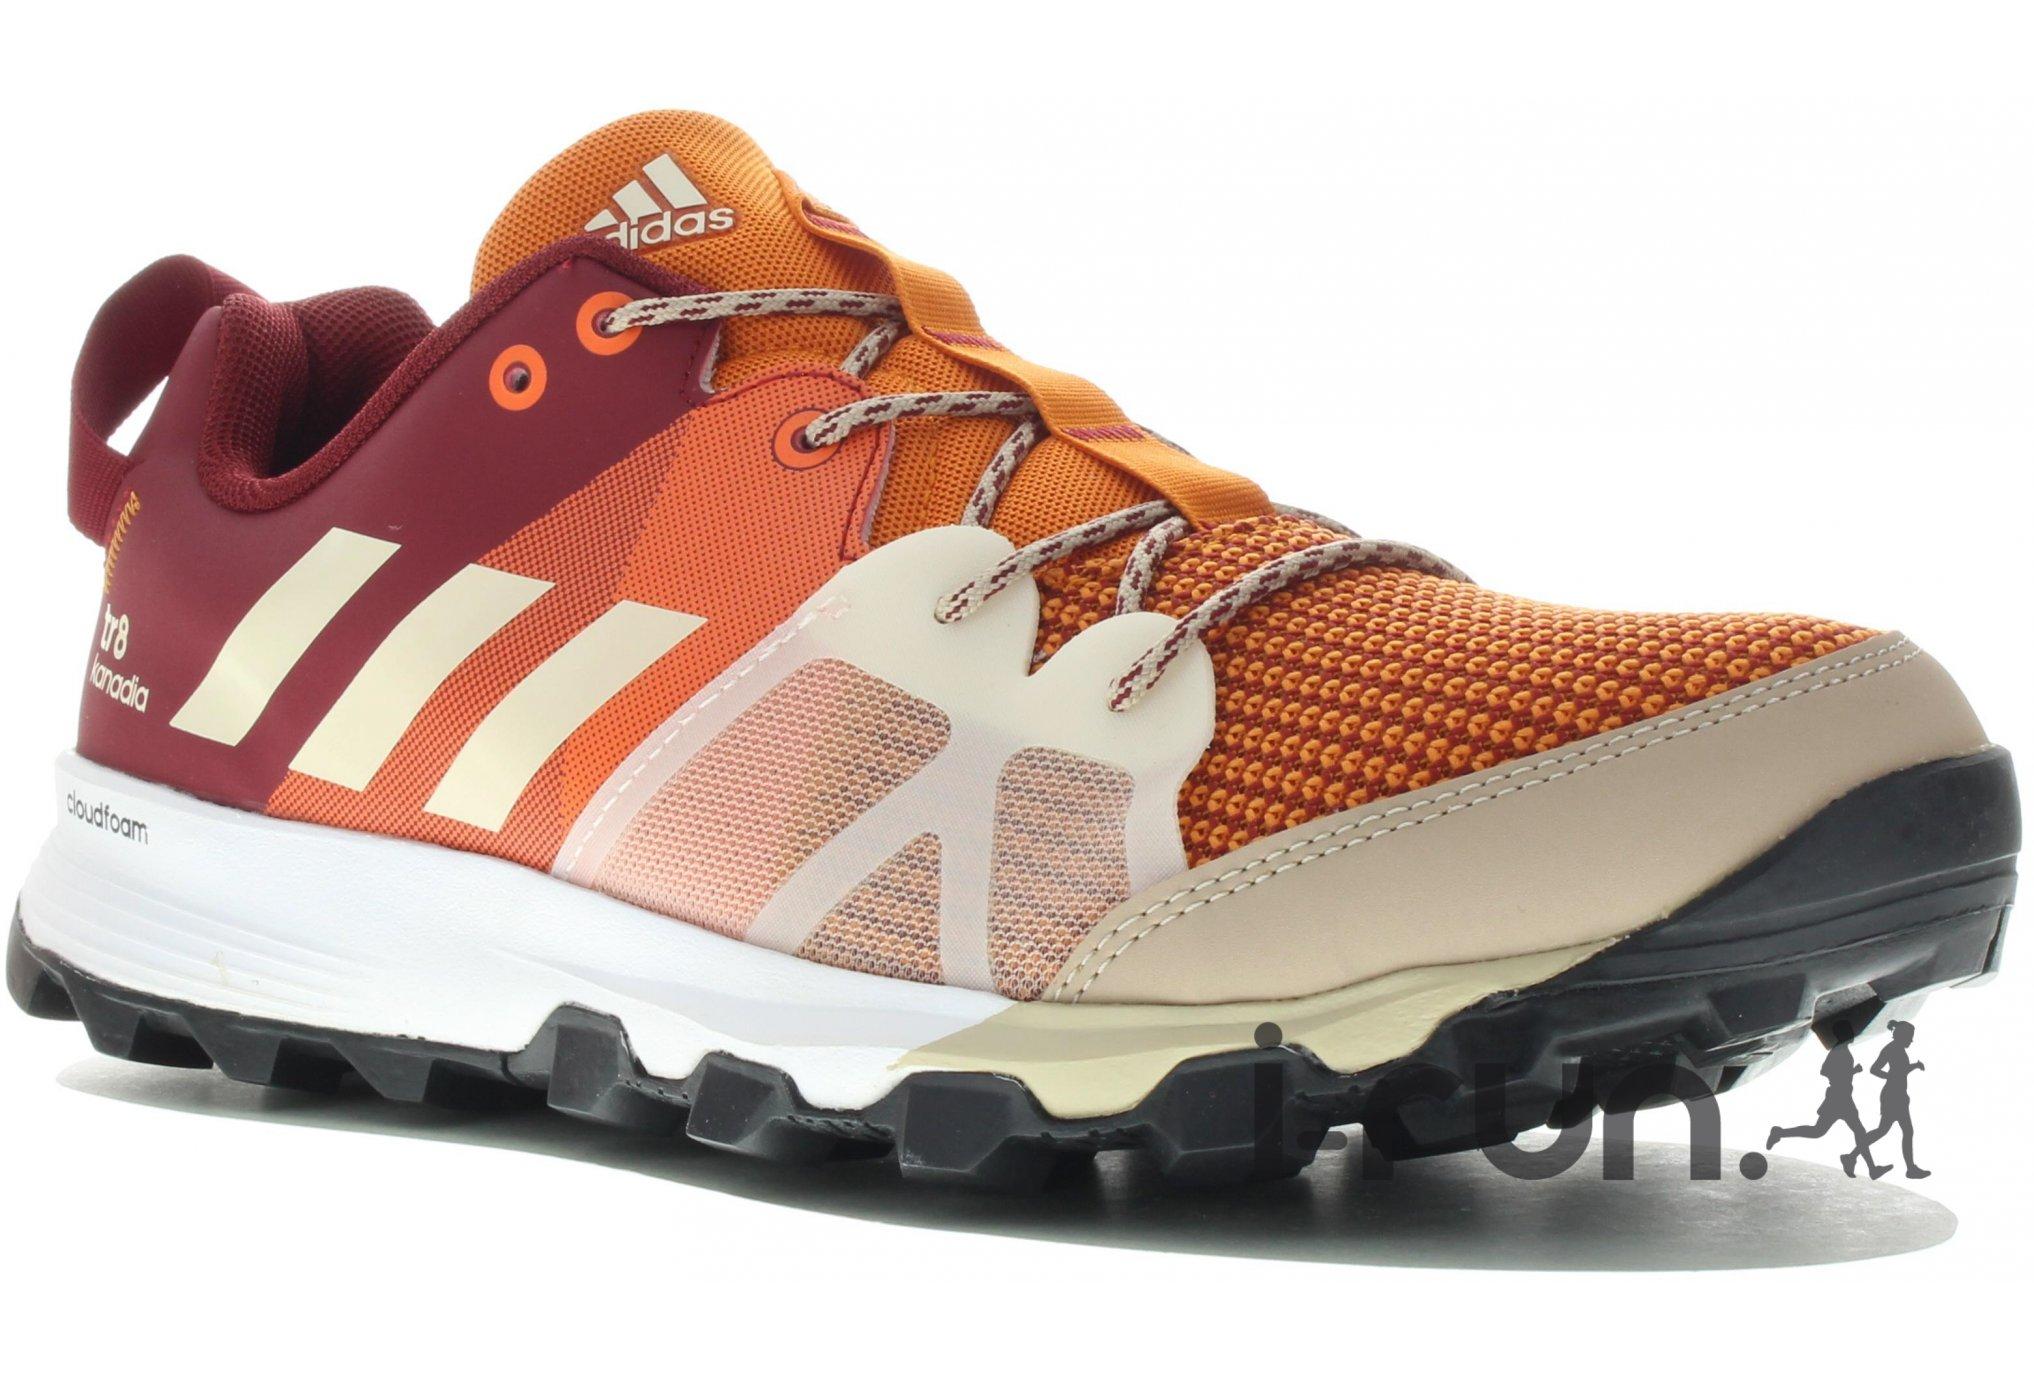 Adidas kanadia 8 tr m chaussures homme